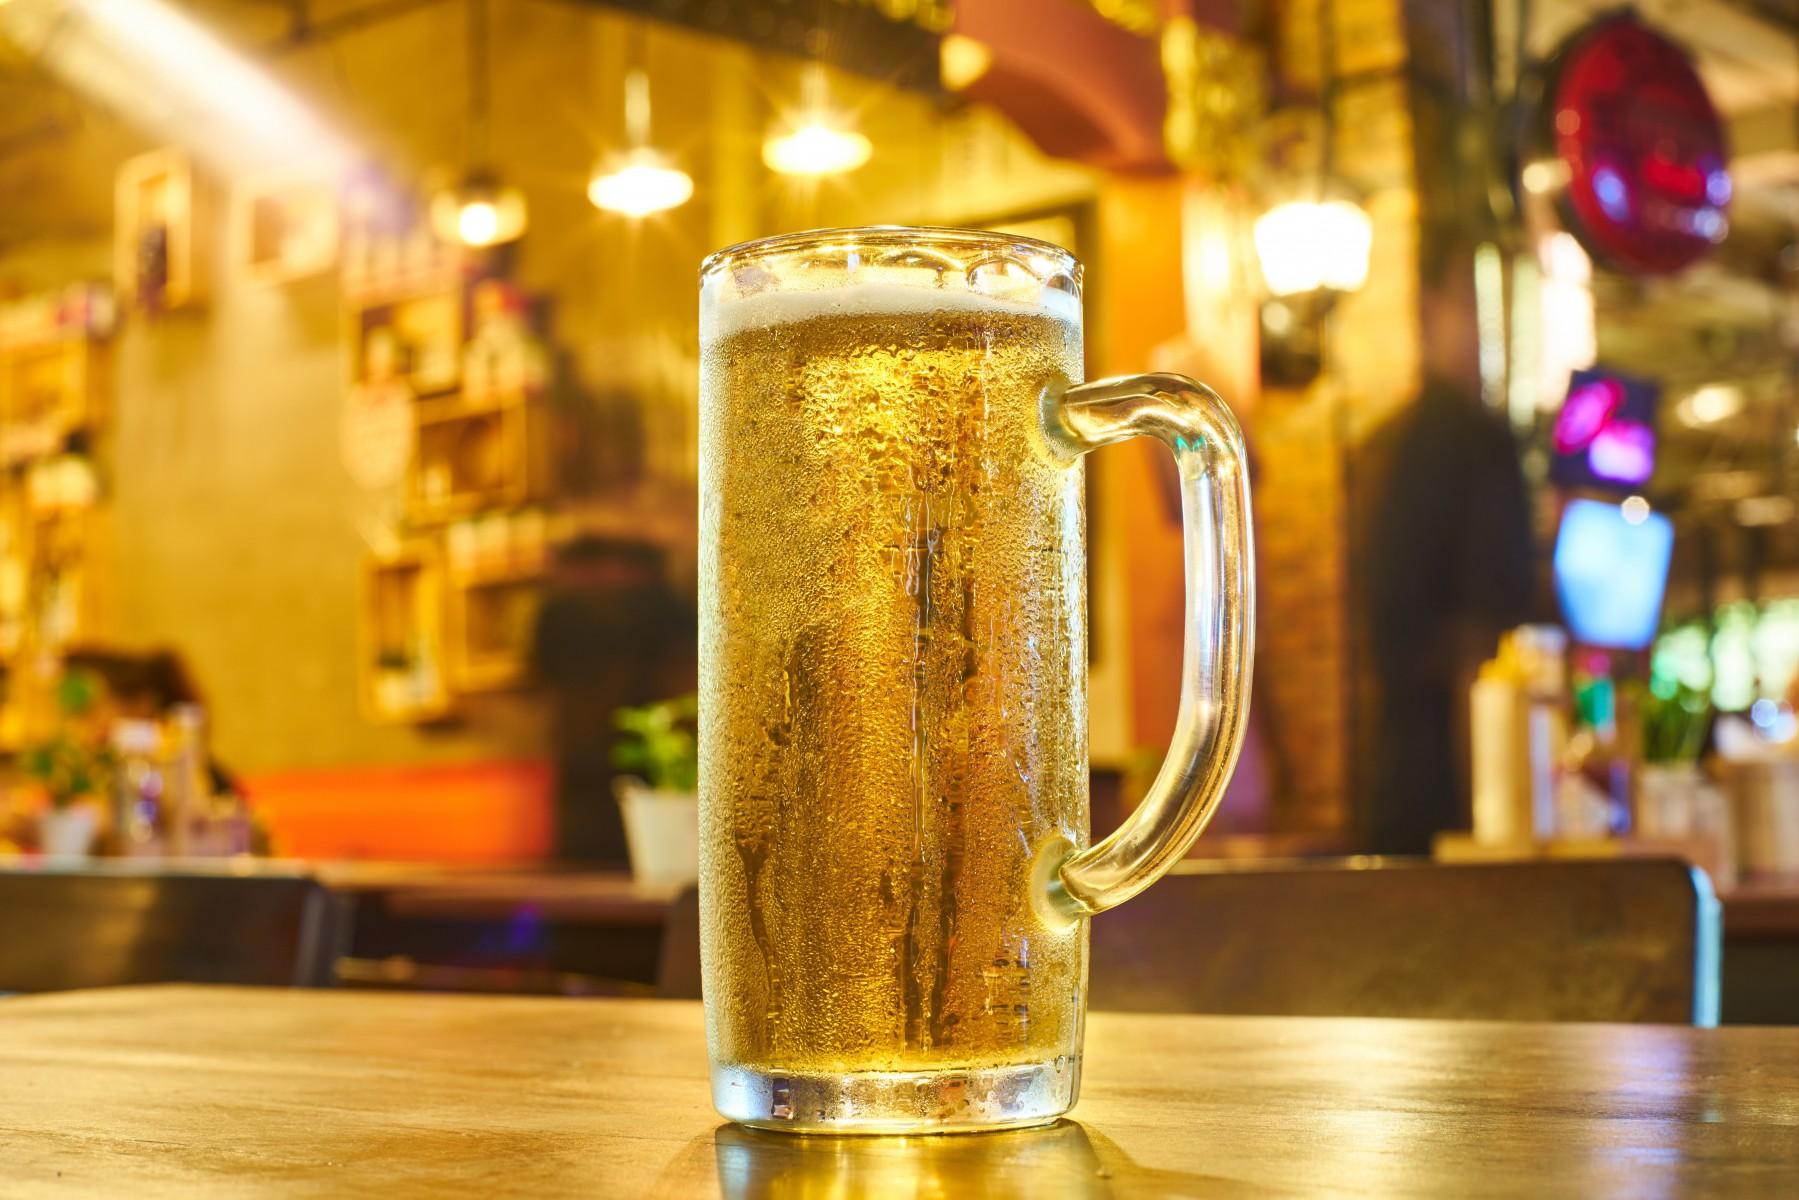 alcohol-background-bar-459280